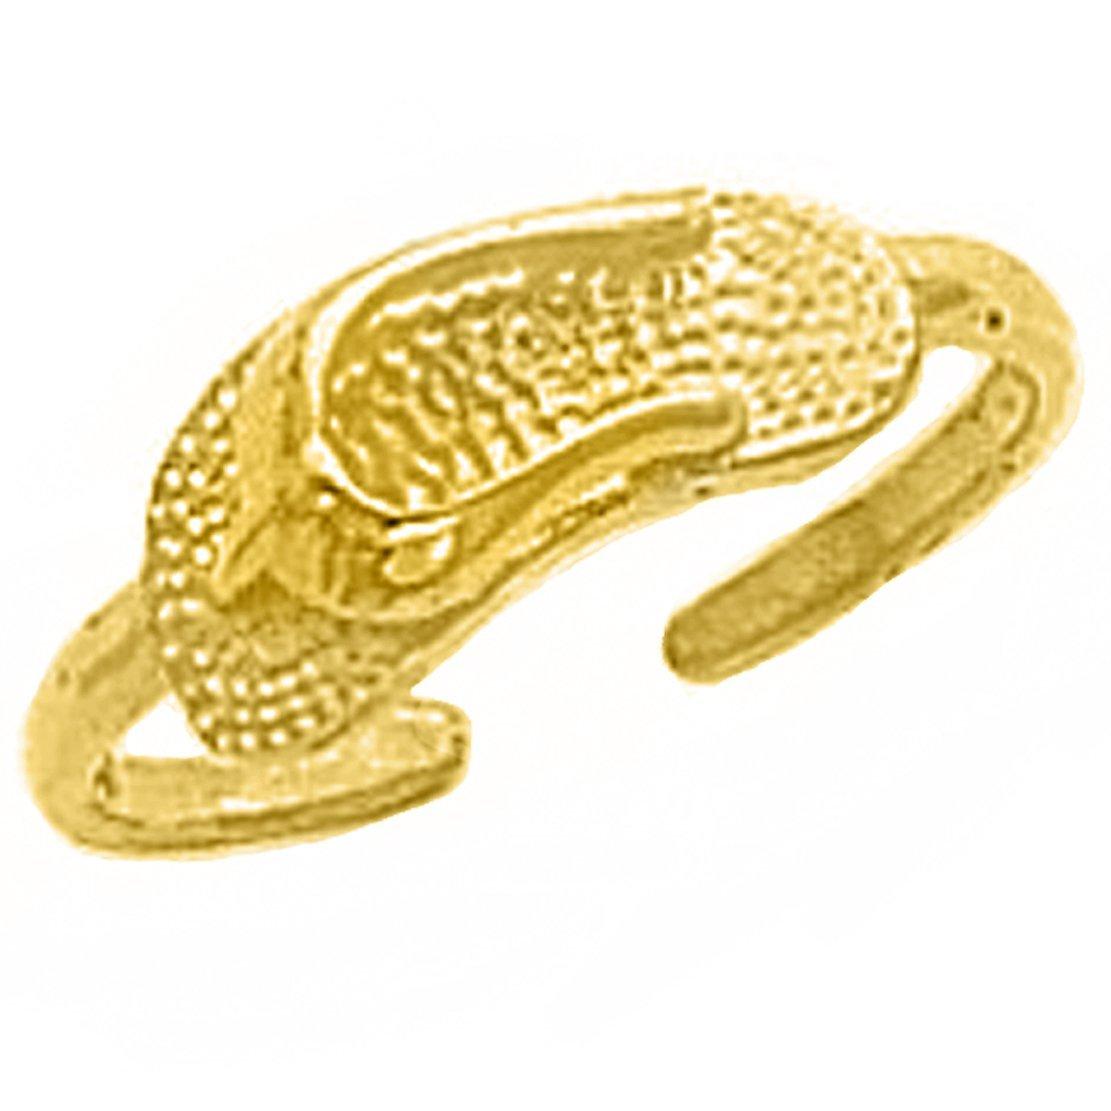 10k Yellow Gold Summer Sandal Toe Ring Claddagh Gold D1957NJ